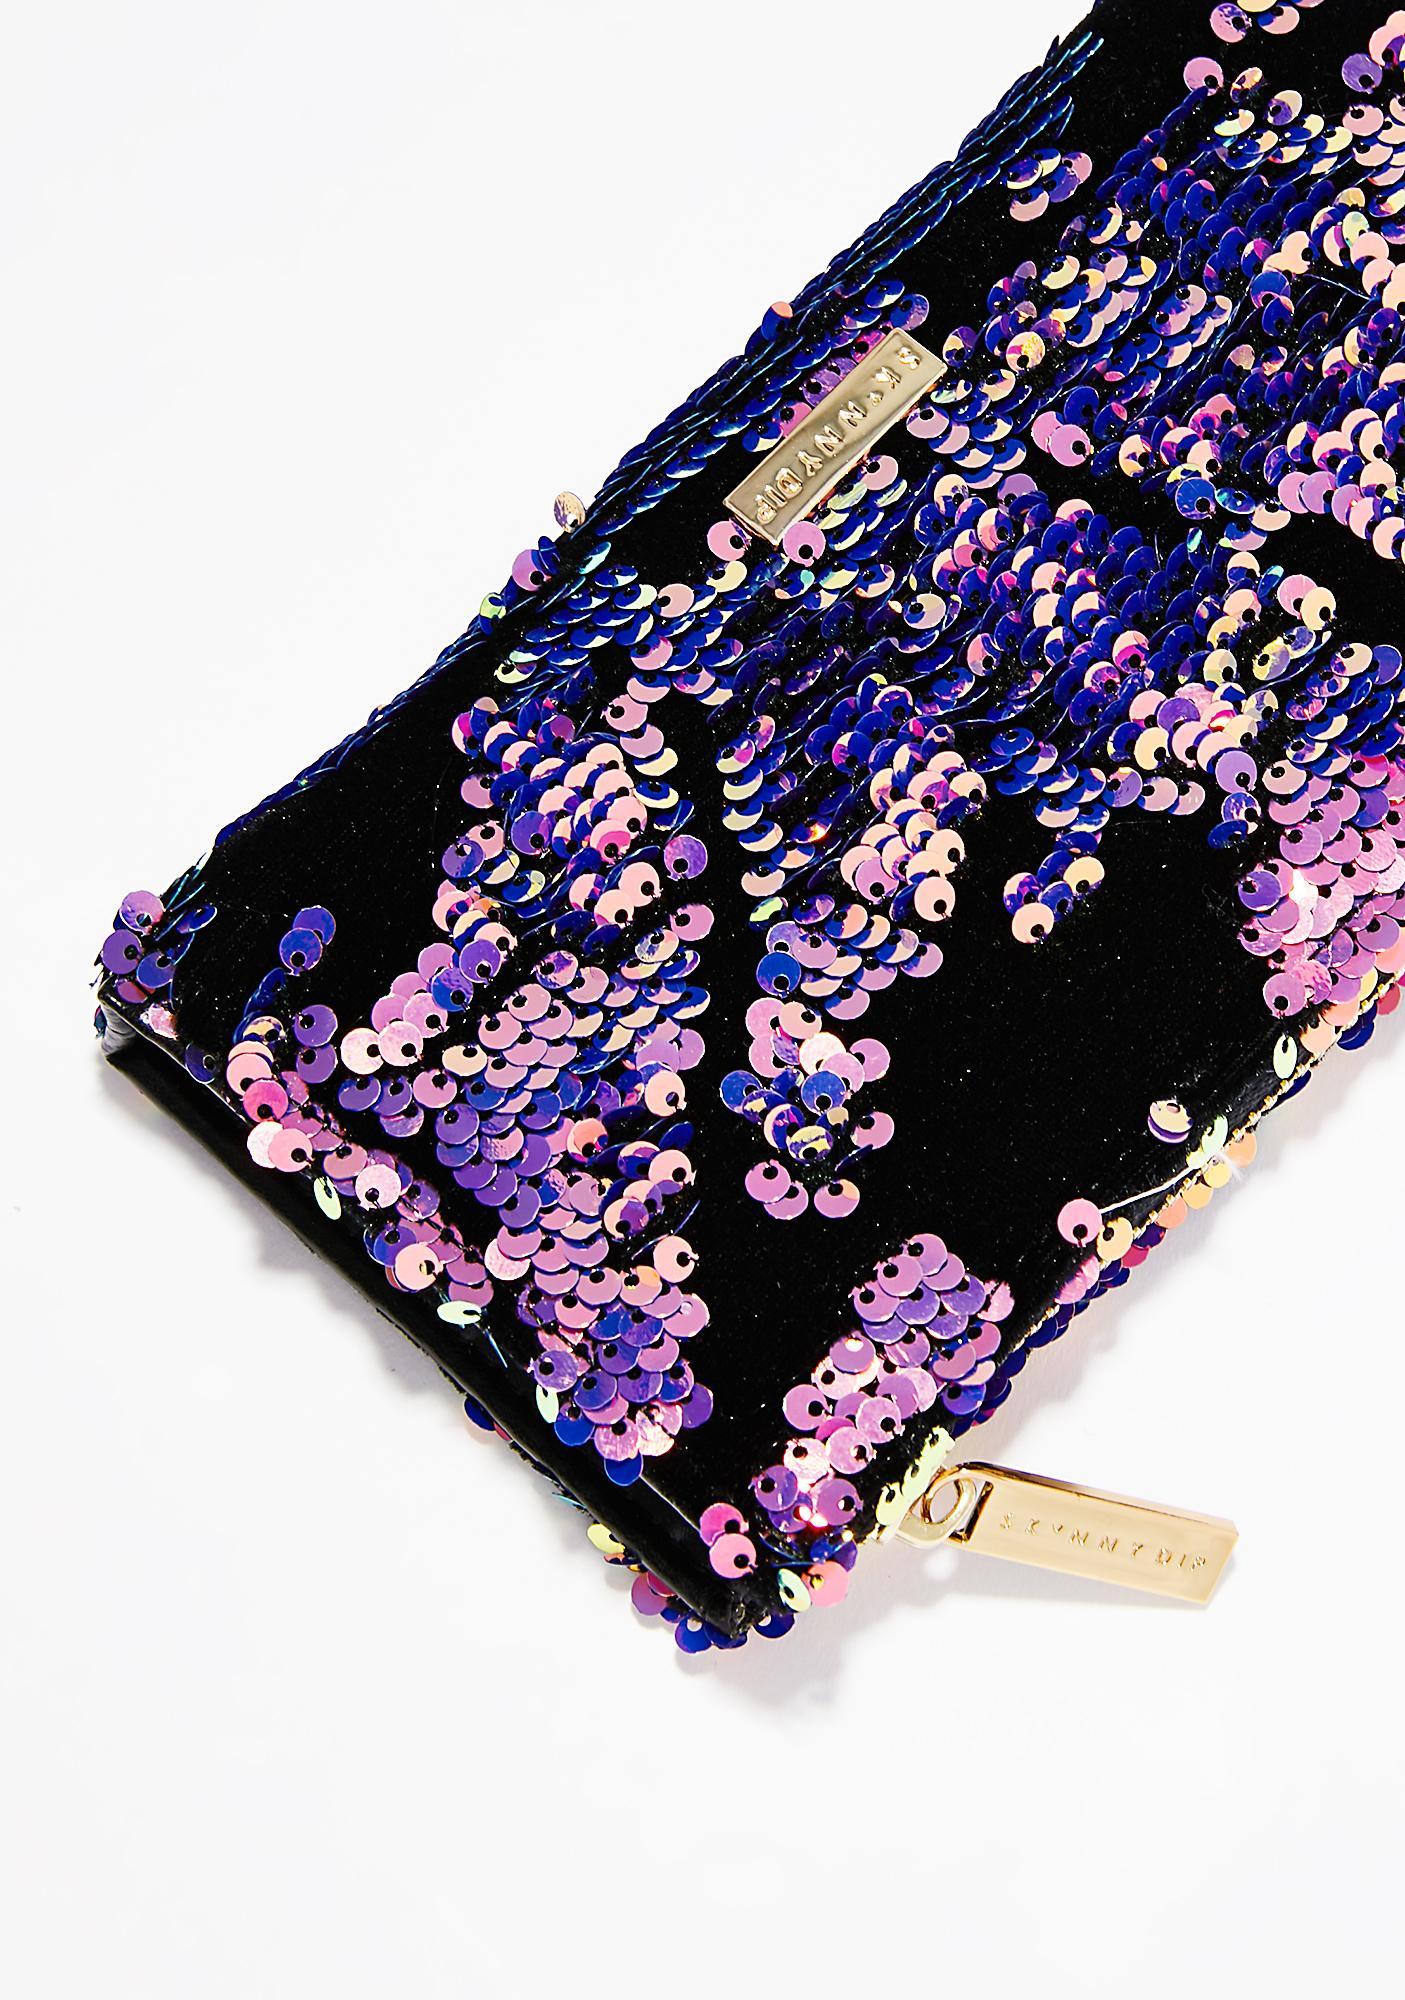 Skinnydip Sequin Luxe Wallet